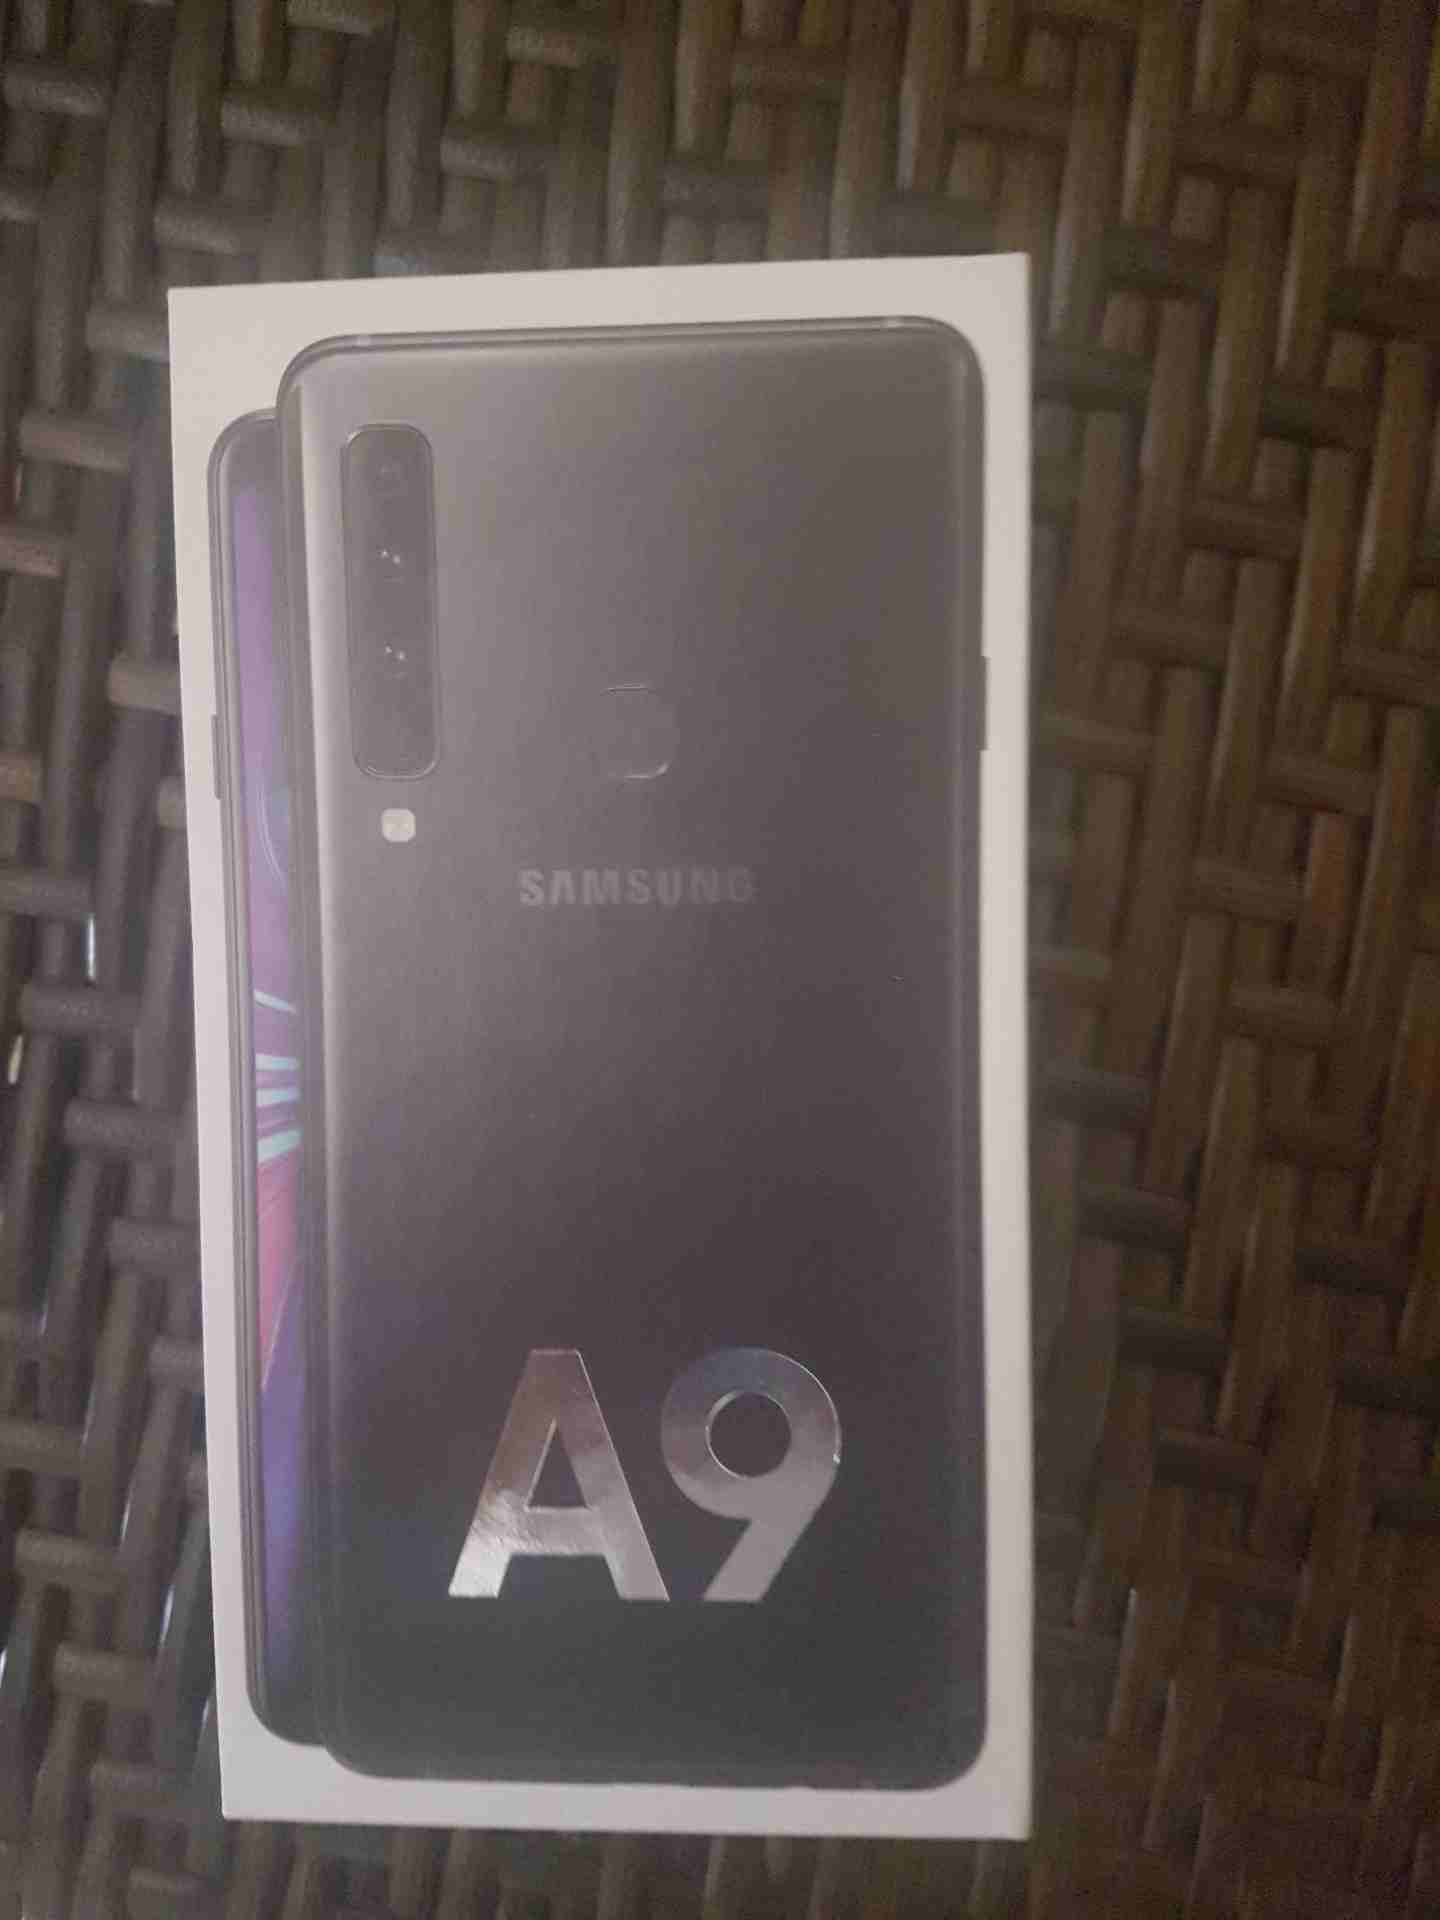 iphone x 256gb-  galaxy a9 جديد بالكرتونة...